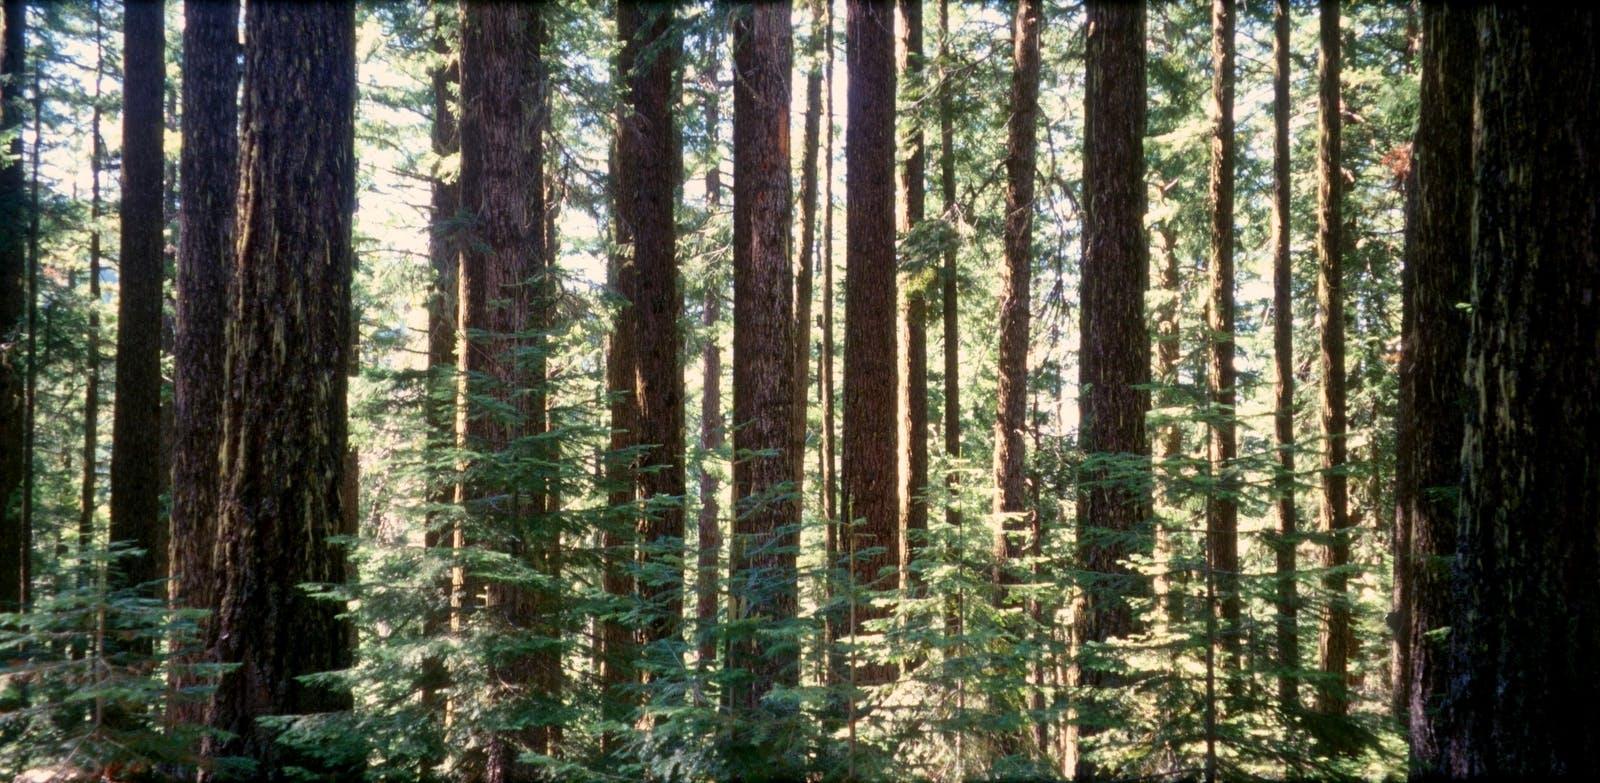 Appalachian-Blue Ridge forests